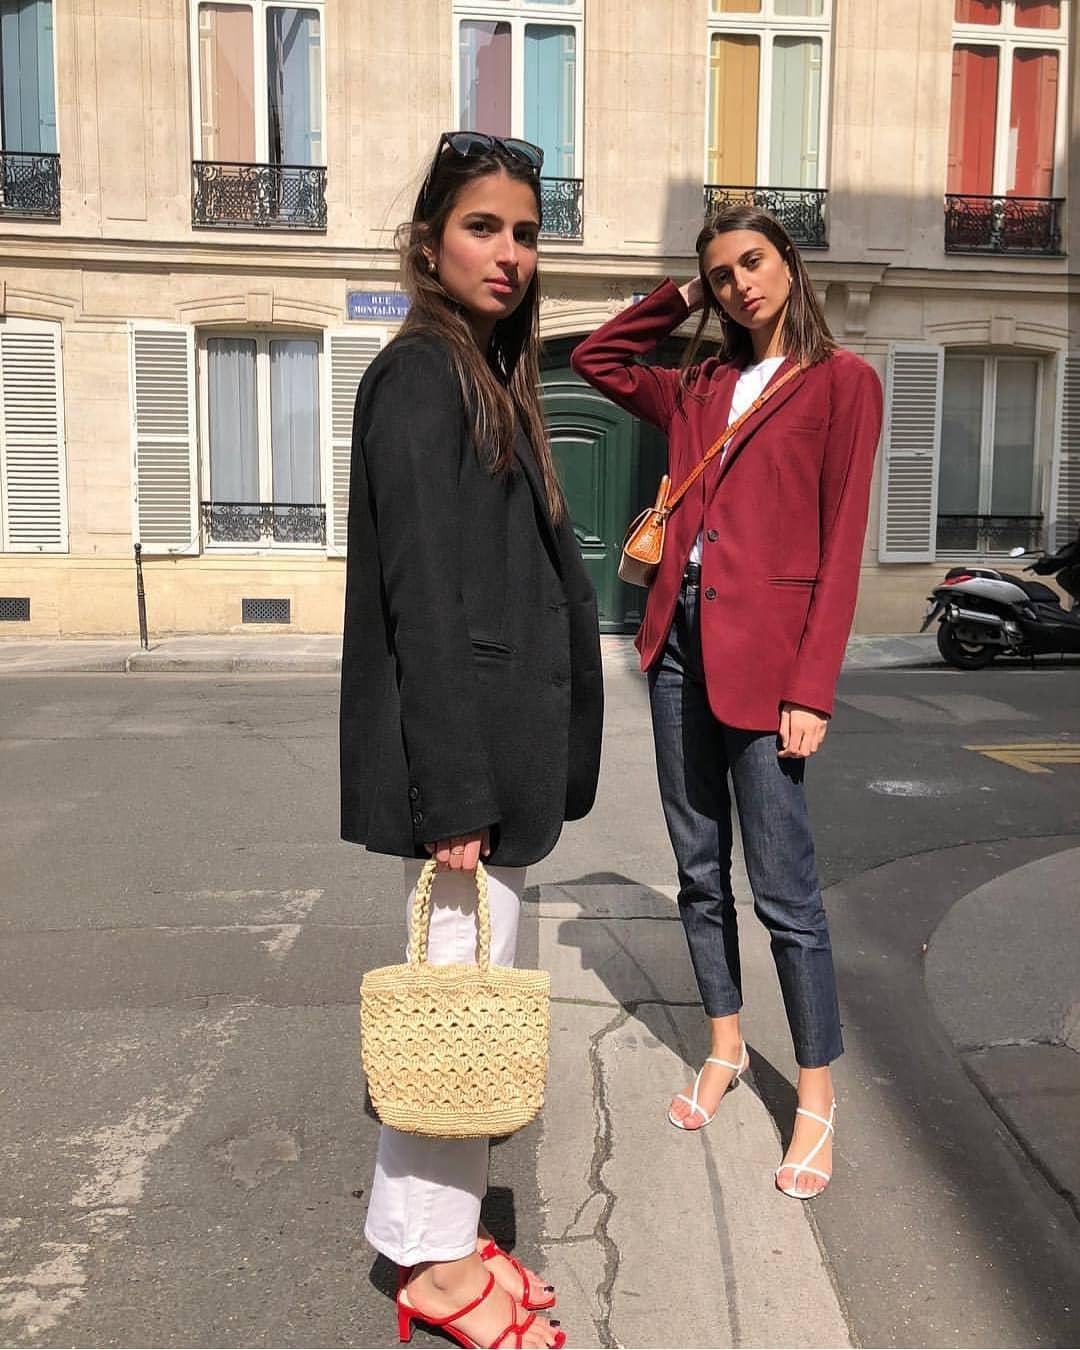 street_style_paris_12_5_2019_13_46_31_577.jpg